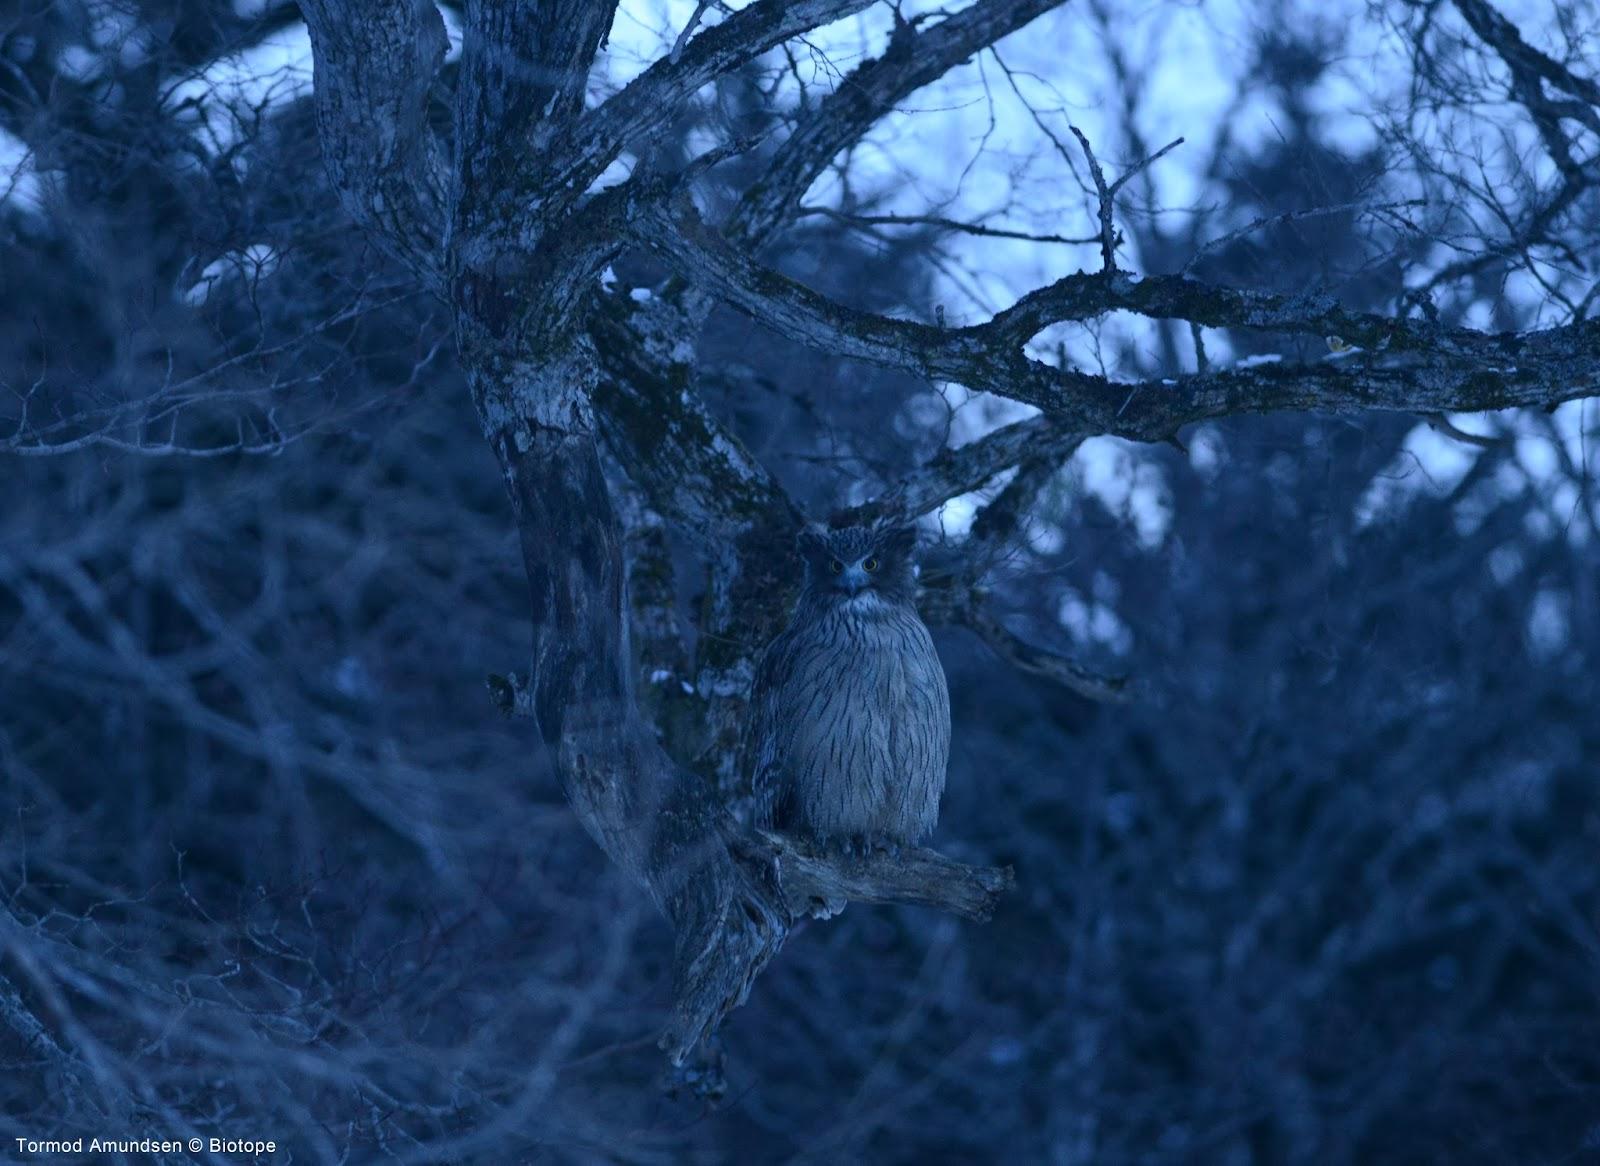 Biotope Birding Japan Hokkaido In Winter Giant Atx Se 2 2014 S Blue Wht Gry